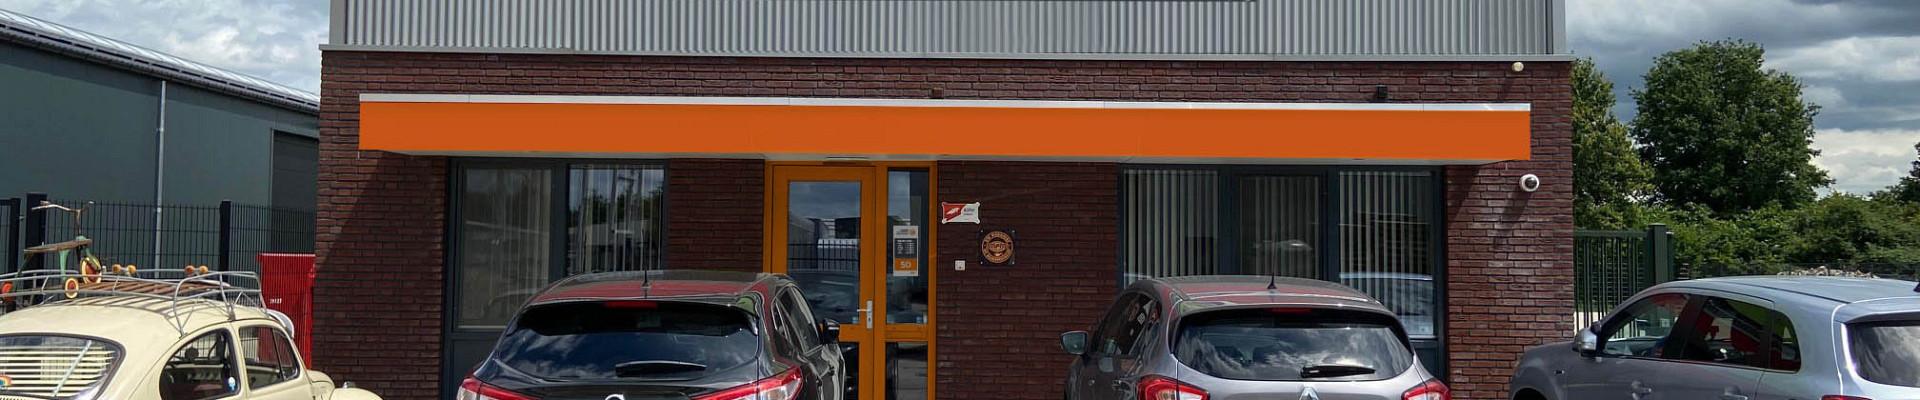 Carteam Ewalds en Wijnen Autoservice